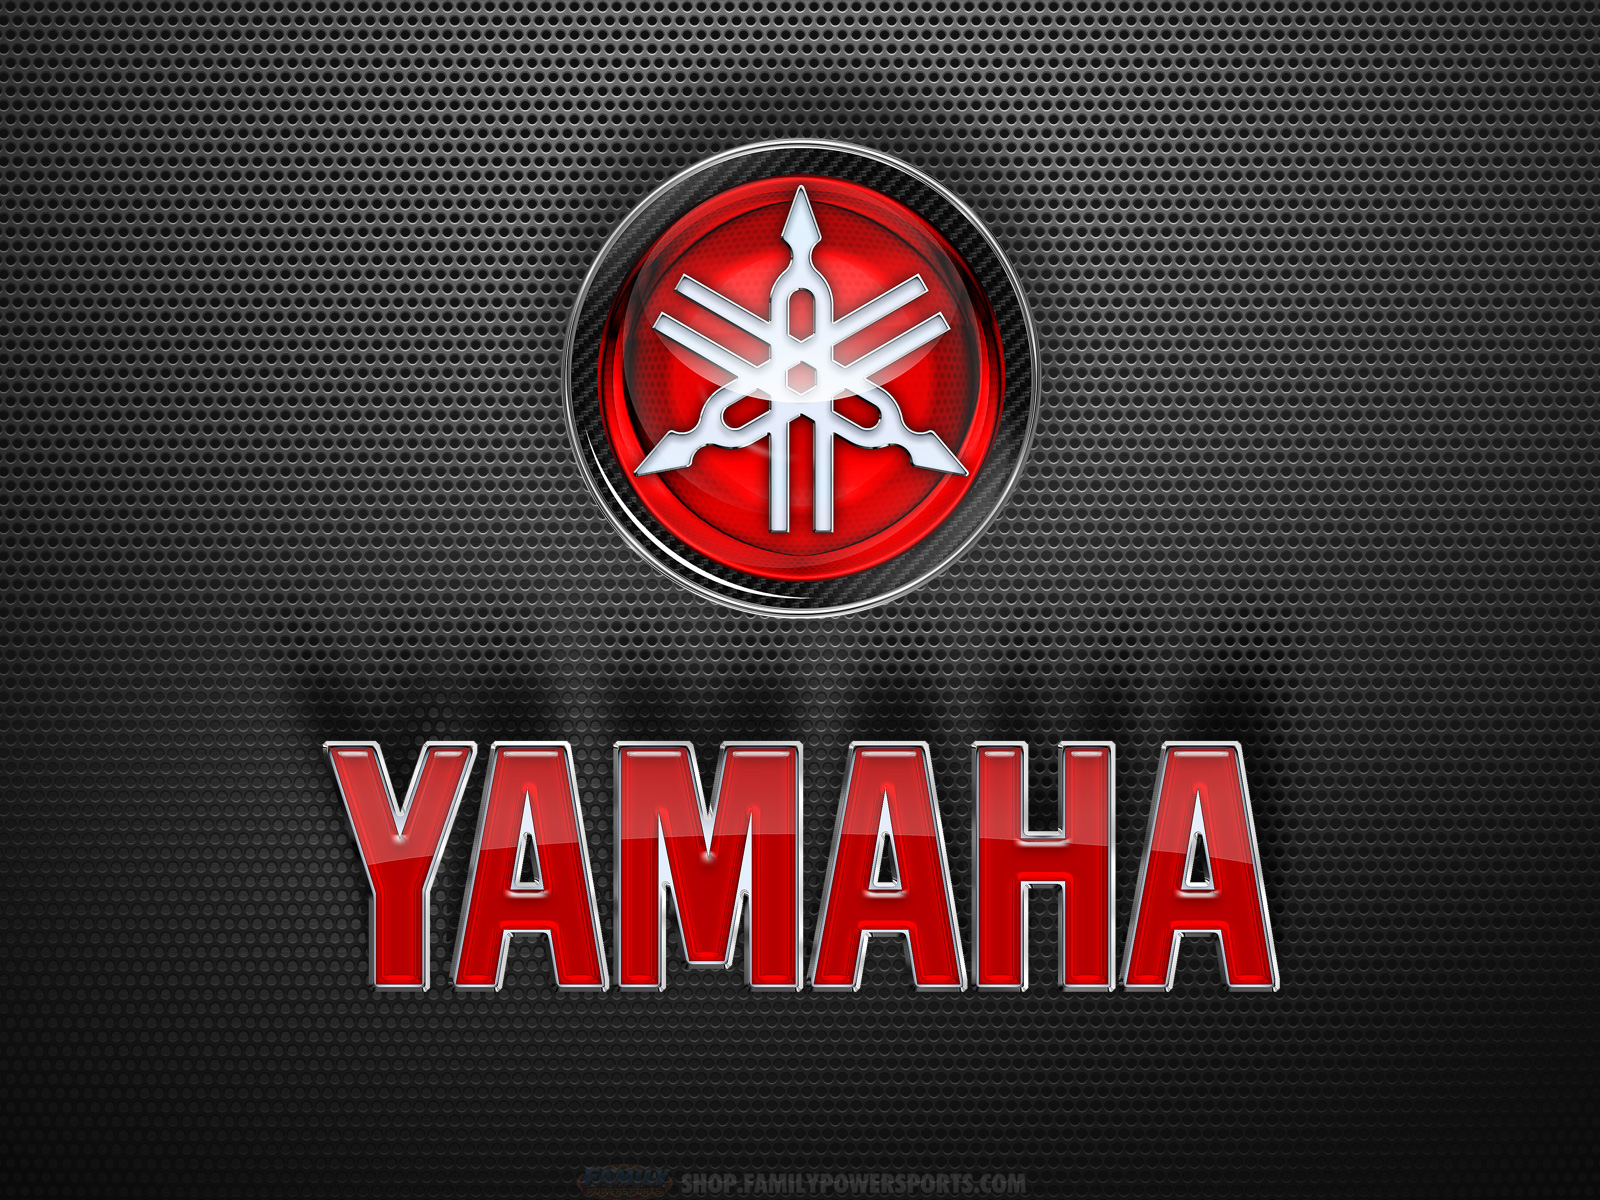 Yamaha Logo Wallpaper Peinture 1600x1200